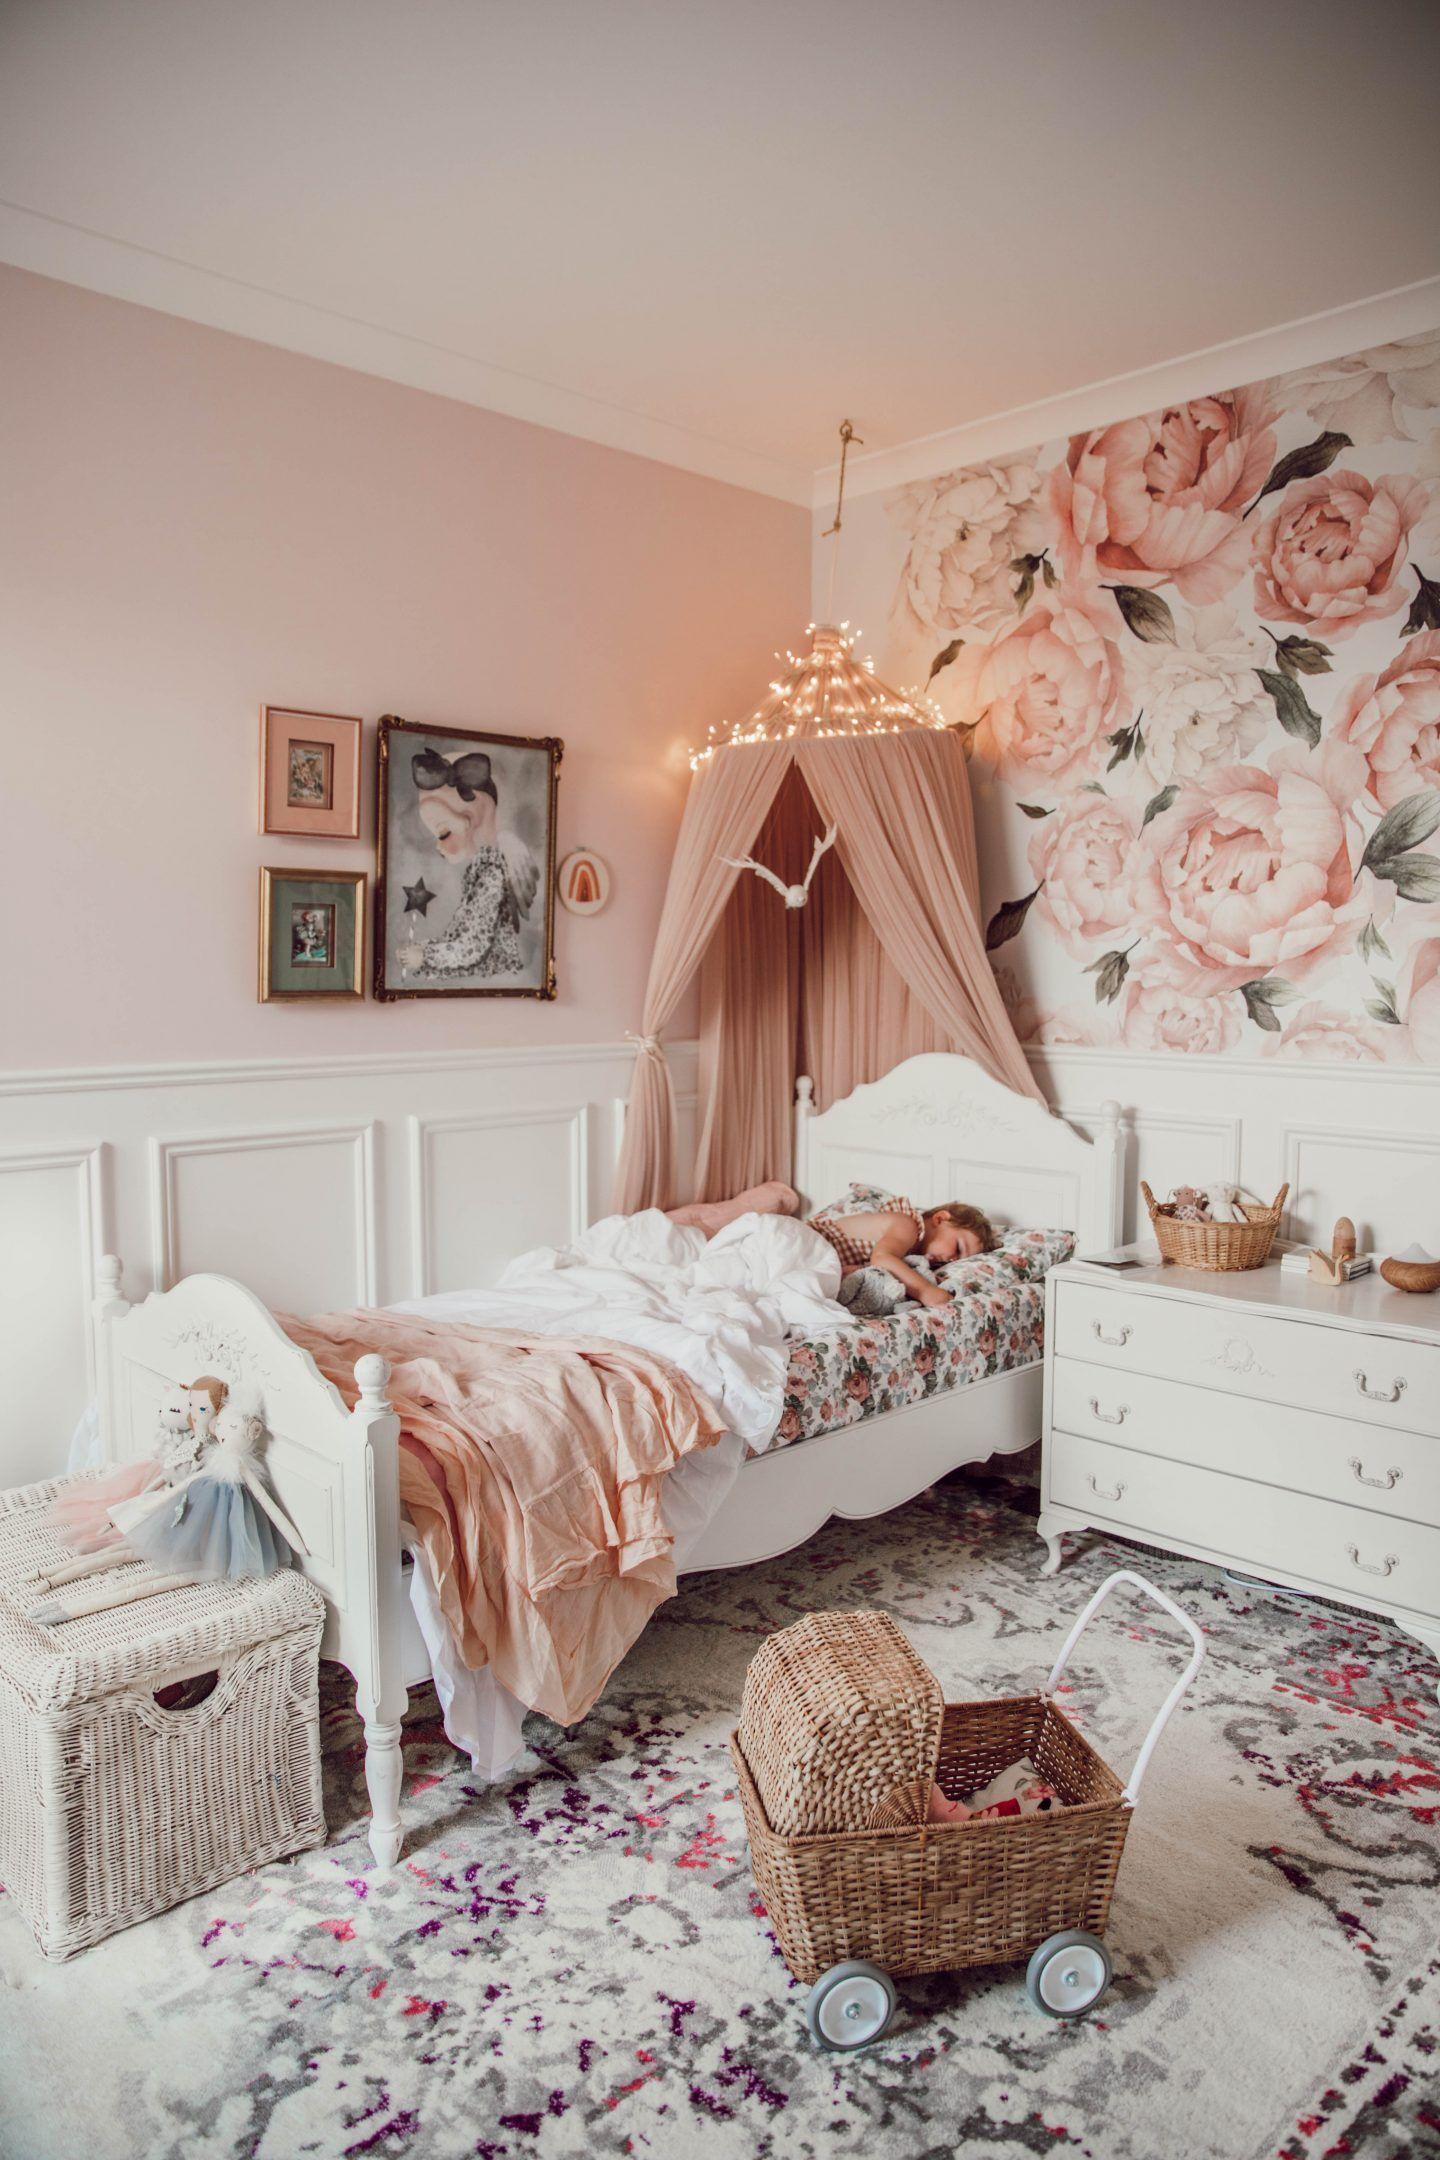 Alaska S Big Girl Room With Exclusive Discounts Miss Kyree Loves Girl Room Girls Room Wallpaper Toddler Girl Room